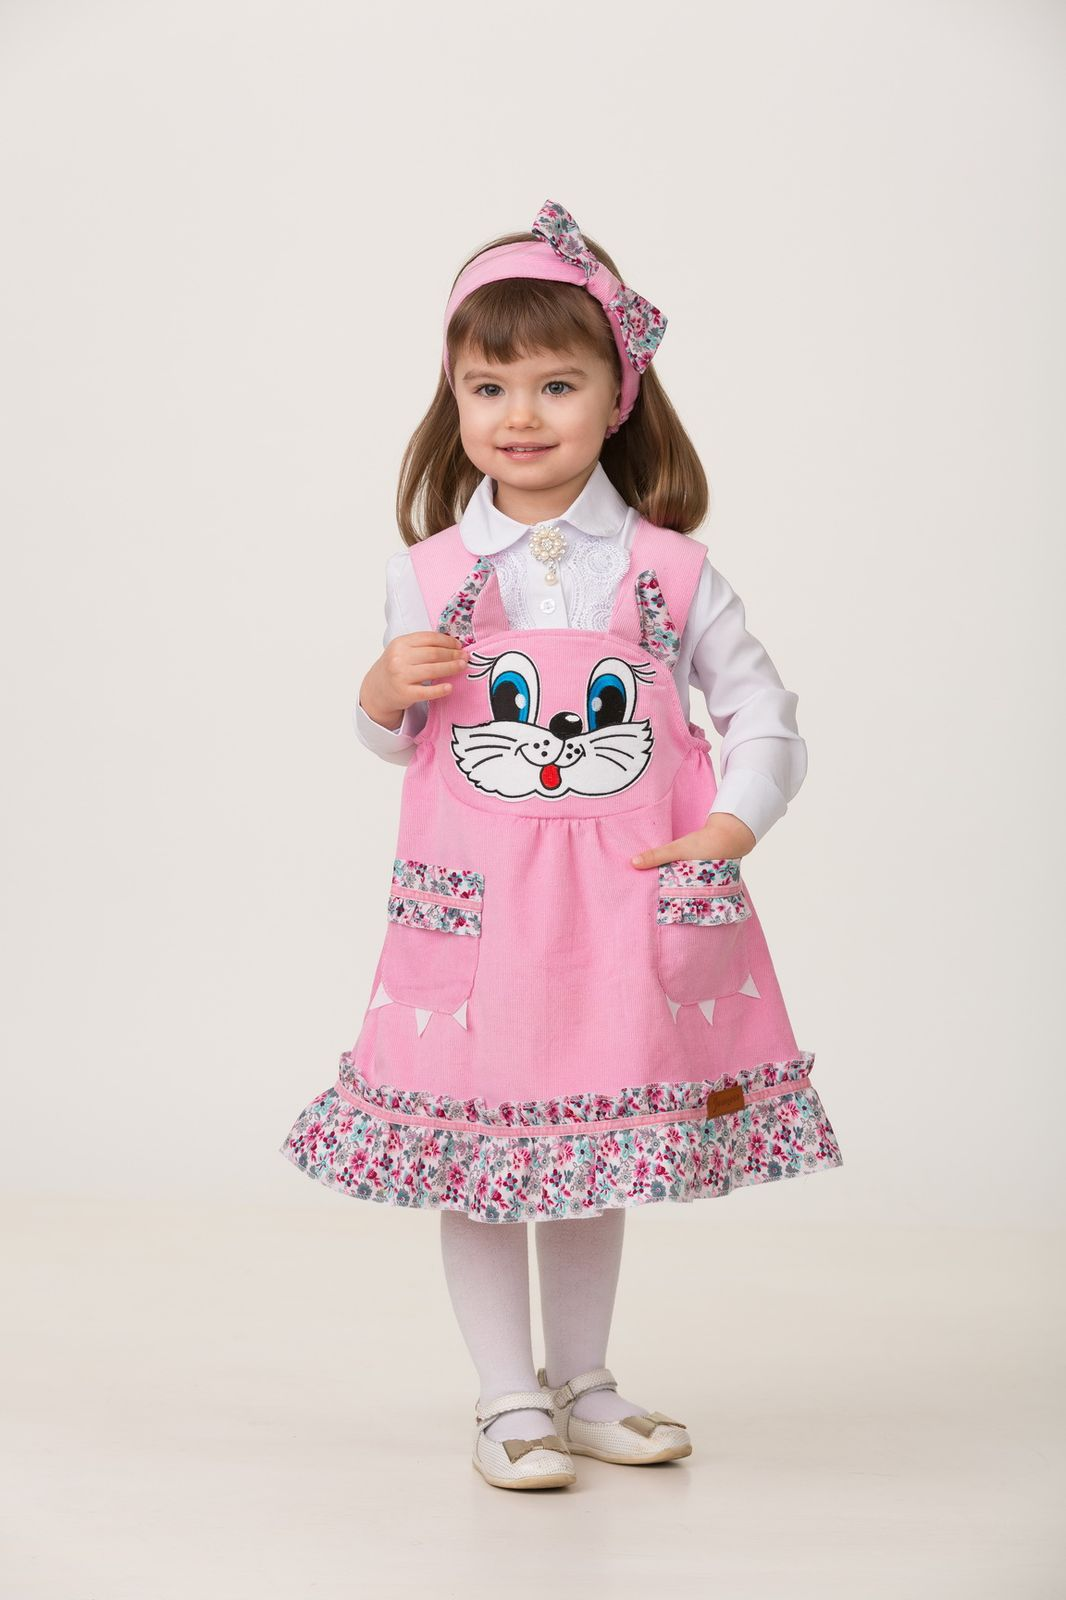 Карнавальный костюм Jeanees Кошечка Царапка, цвет: розовый. Размер: 28 jeanees карнавальный костюм врач jeanees